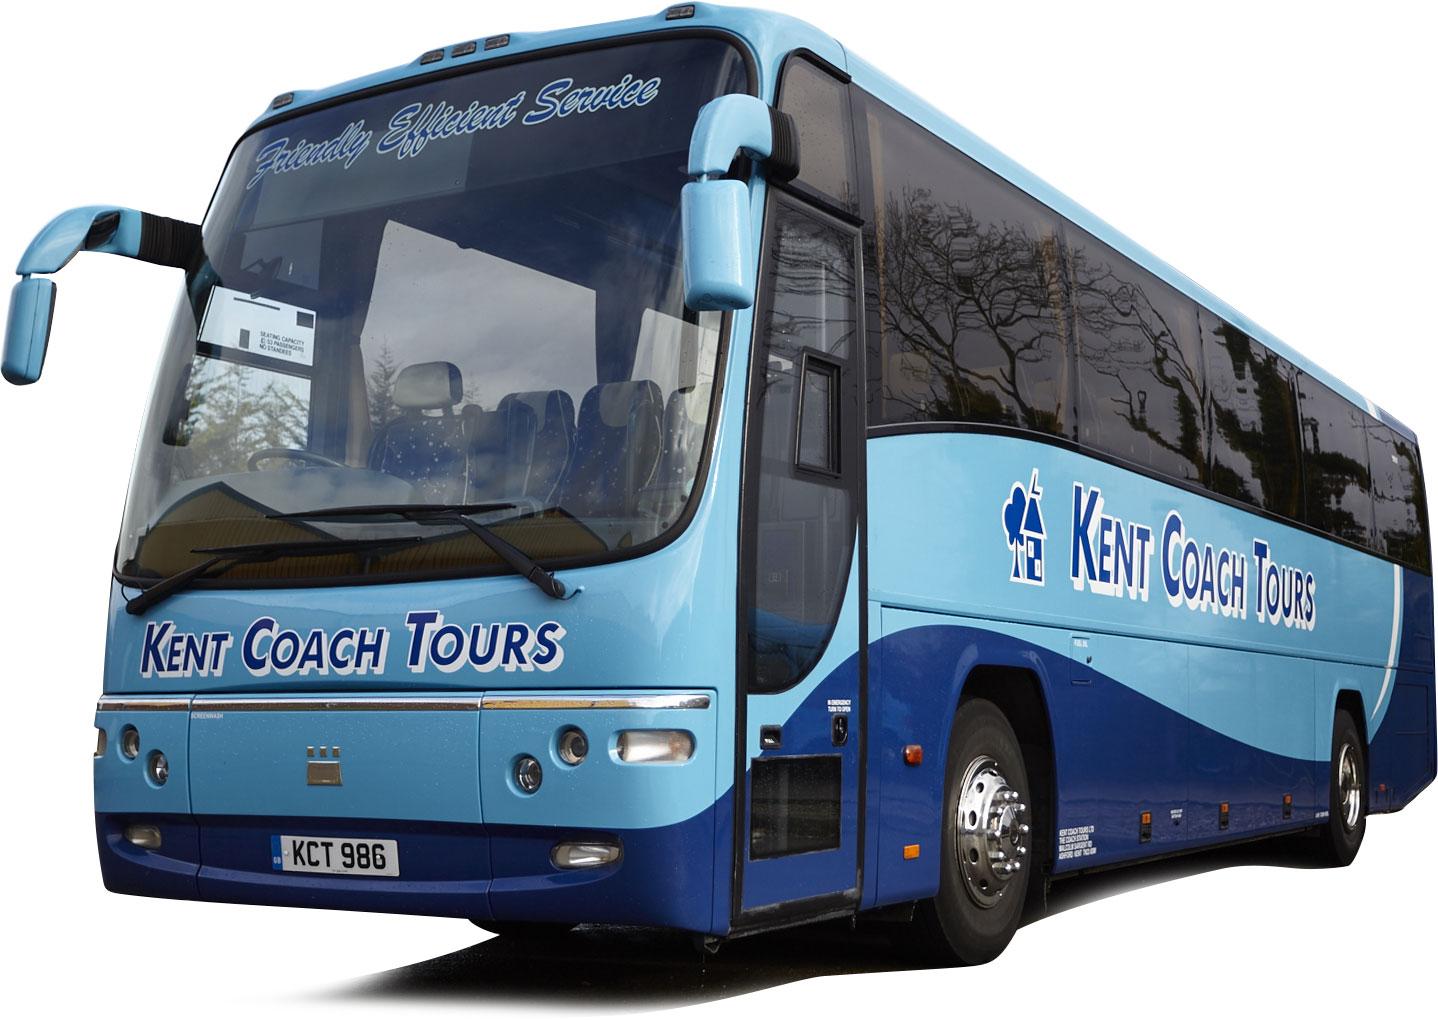 70 Seat Standard - Kent Coach Tours